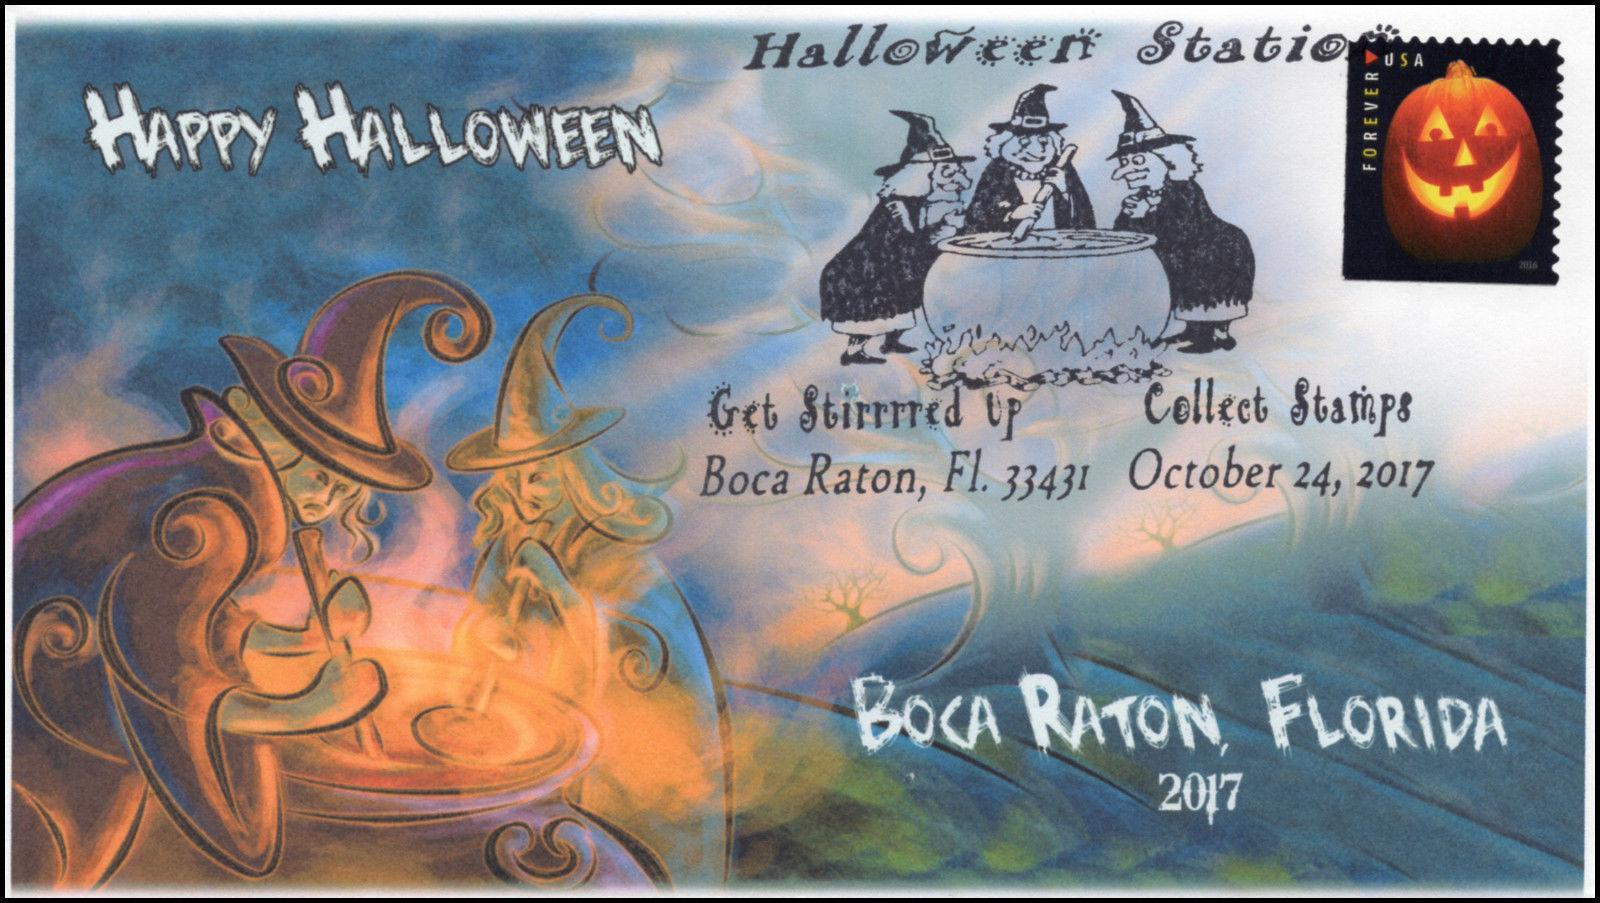 17-313, 2017,Halloween, Event Cover, Pictorial Postmark, Boca Raton